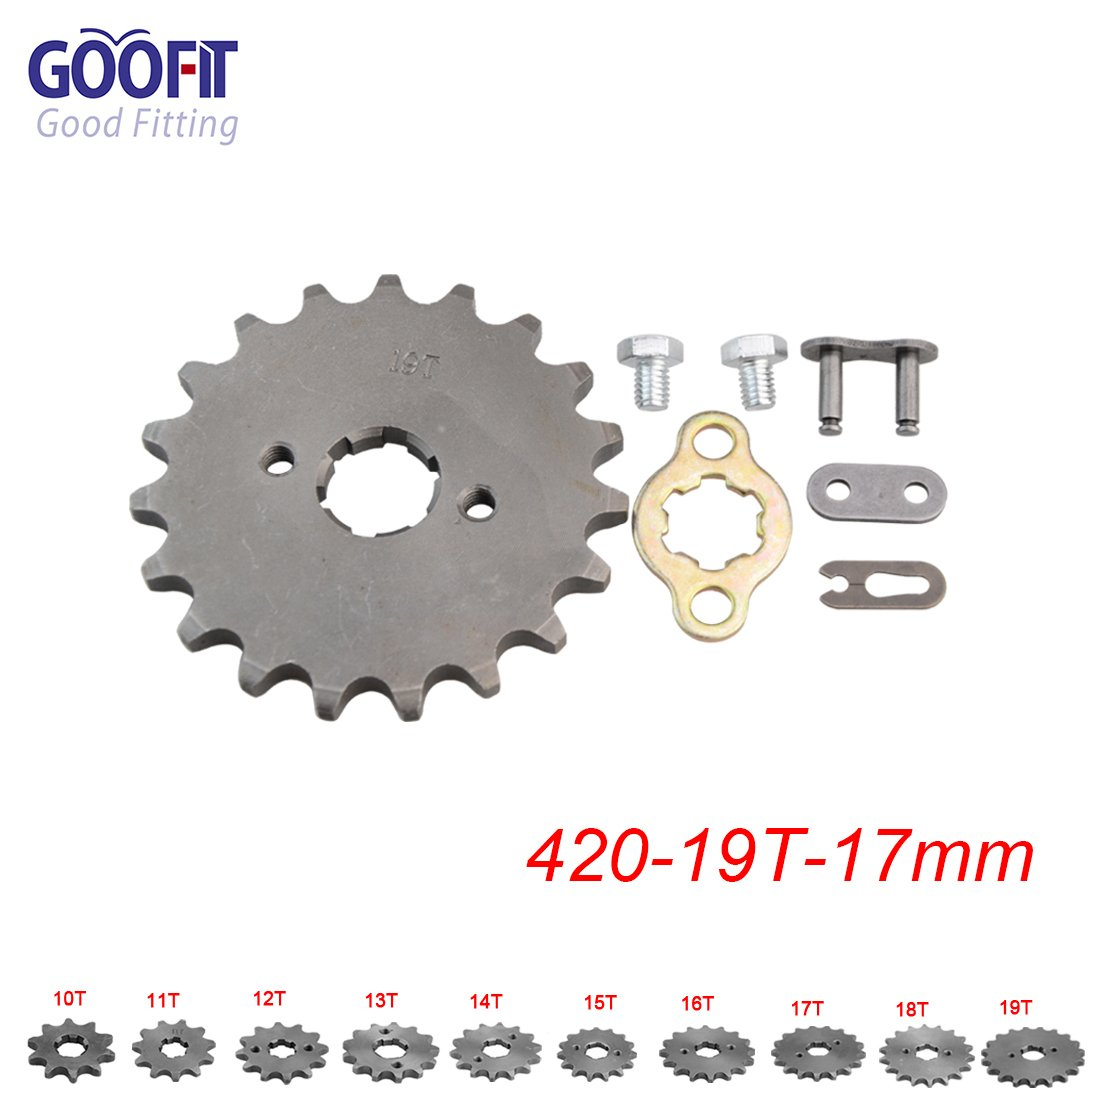 GOOFIT 17mm Sprocket Front for Motorcycle ATV Dirt Bike 420-19T